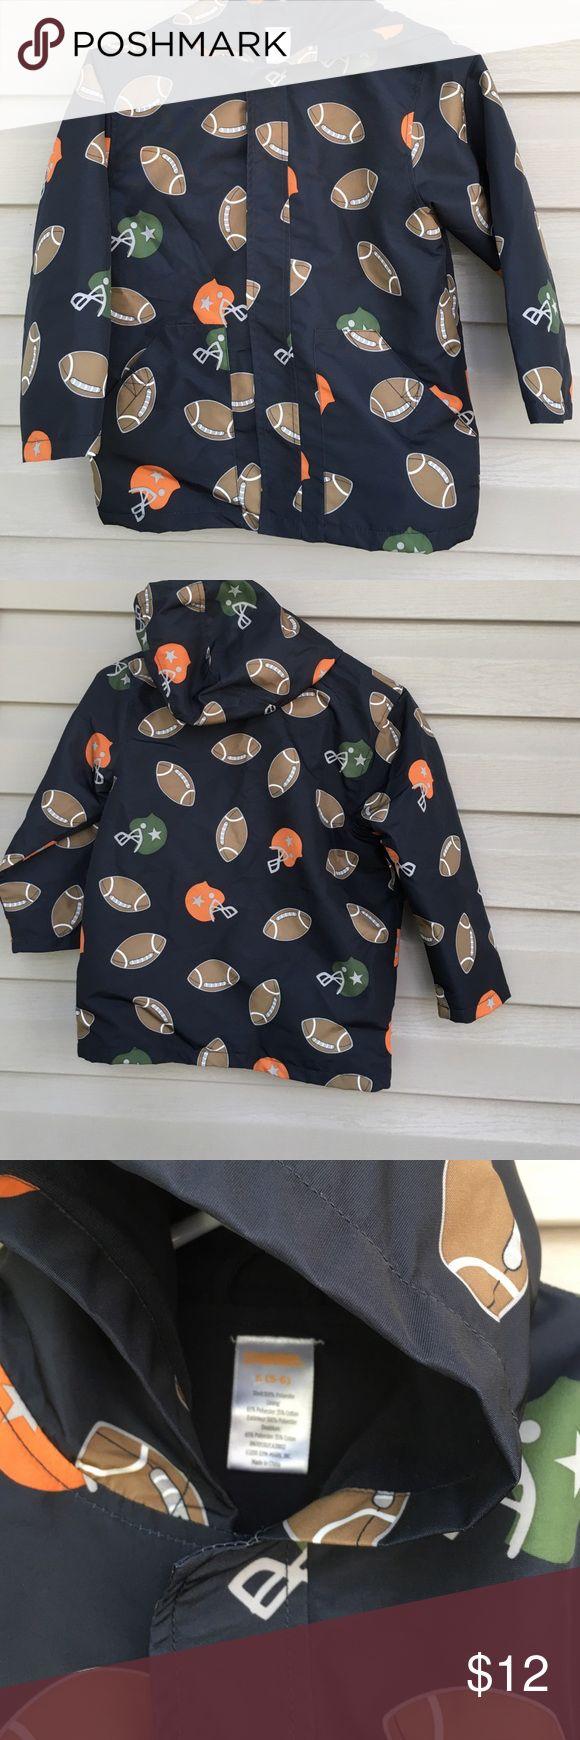 Gymboree boys raincoat Like new boys hooded raincoat lined with front pockets Velcro close no stains or holes. Football print Gymboree Jackets & Coats Raincoats